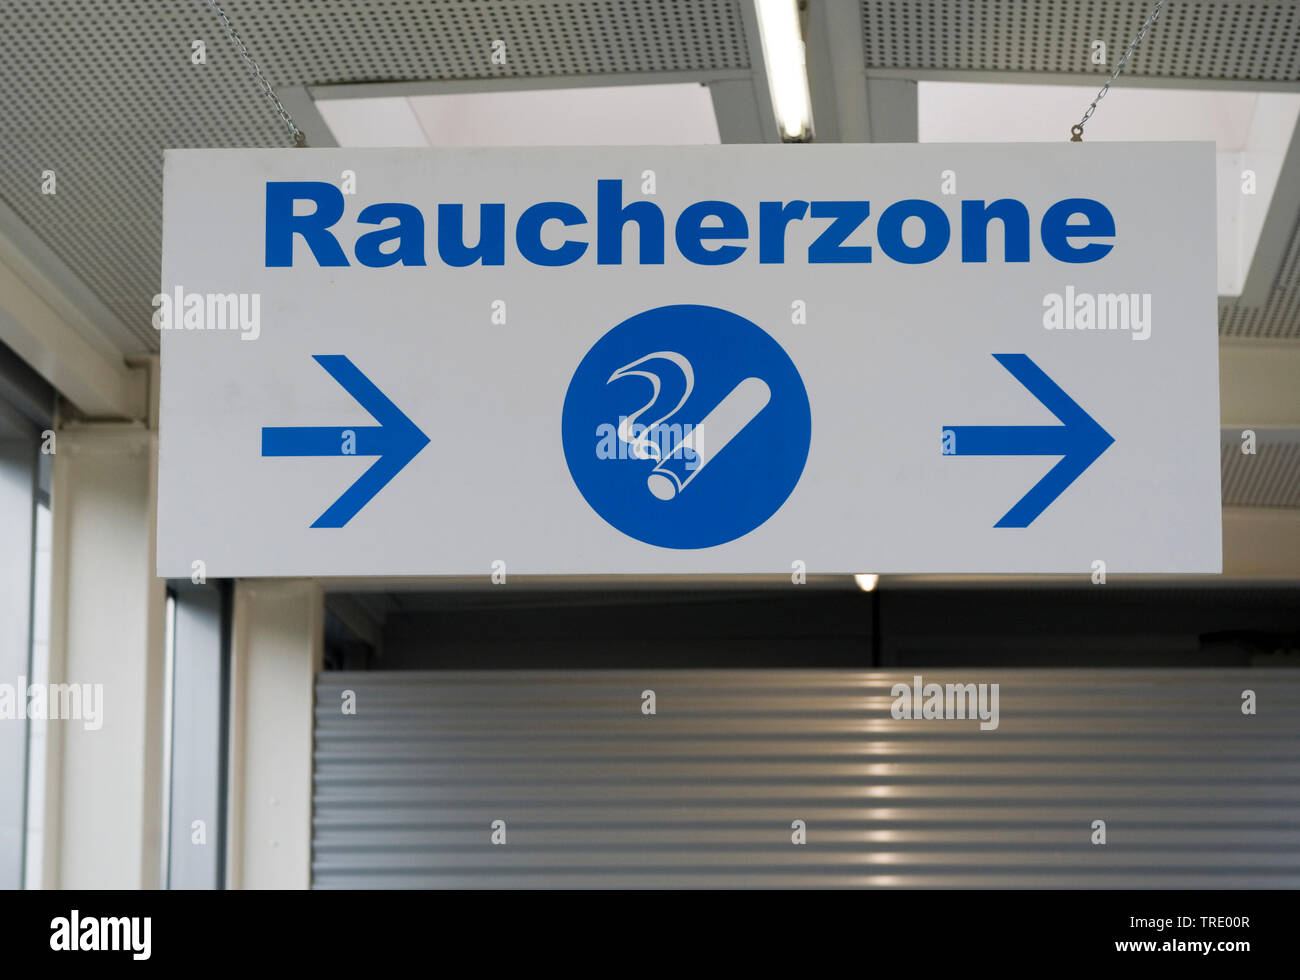 Wegweiser zu einer Raucherzone  | Sign post for a smoking area | BLWS512922.jpg [ (c) blickwinkel/McPHOTO/M. Begsteiger Tel. +49 (0)2302-2793220, E-ma - Stock Image